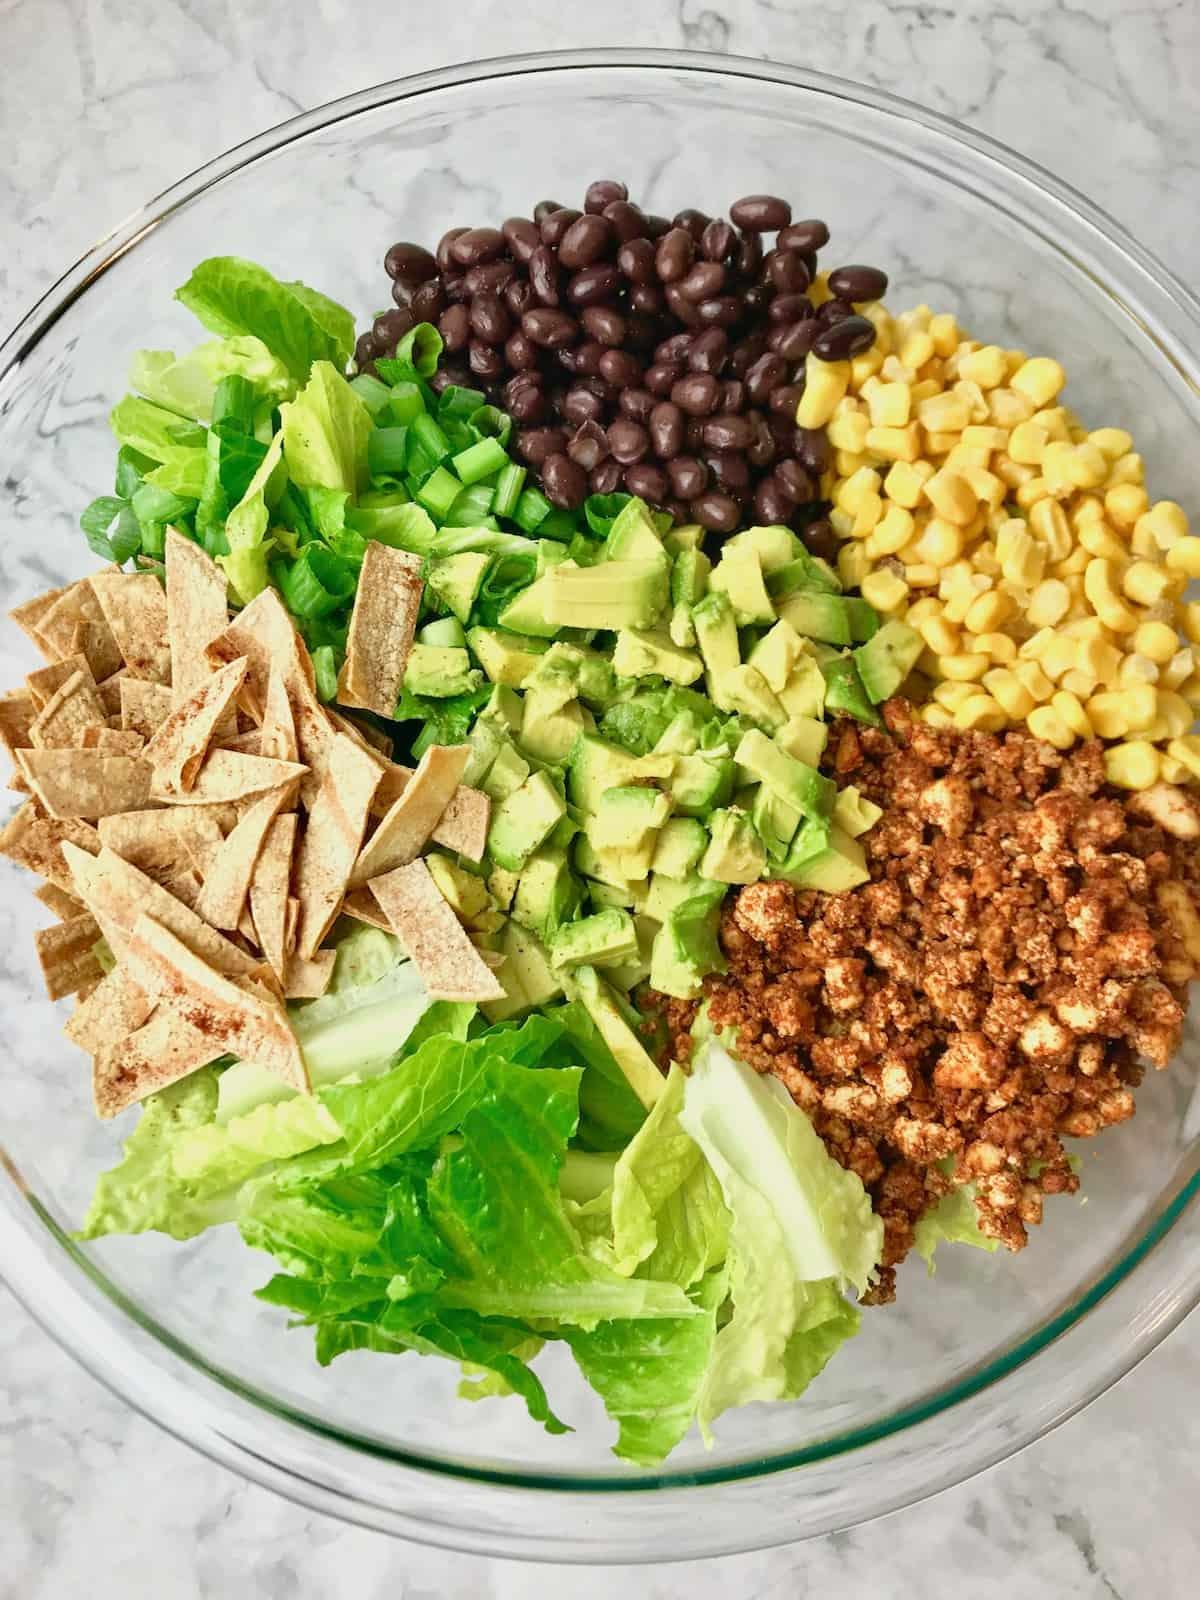 Black beans, corn, tofu, lettuce, tortilla strips, avocado, and lettuce in a bowl.